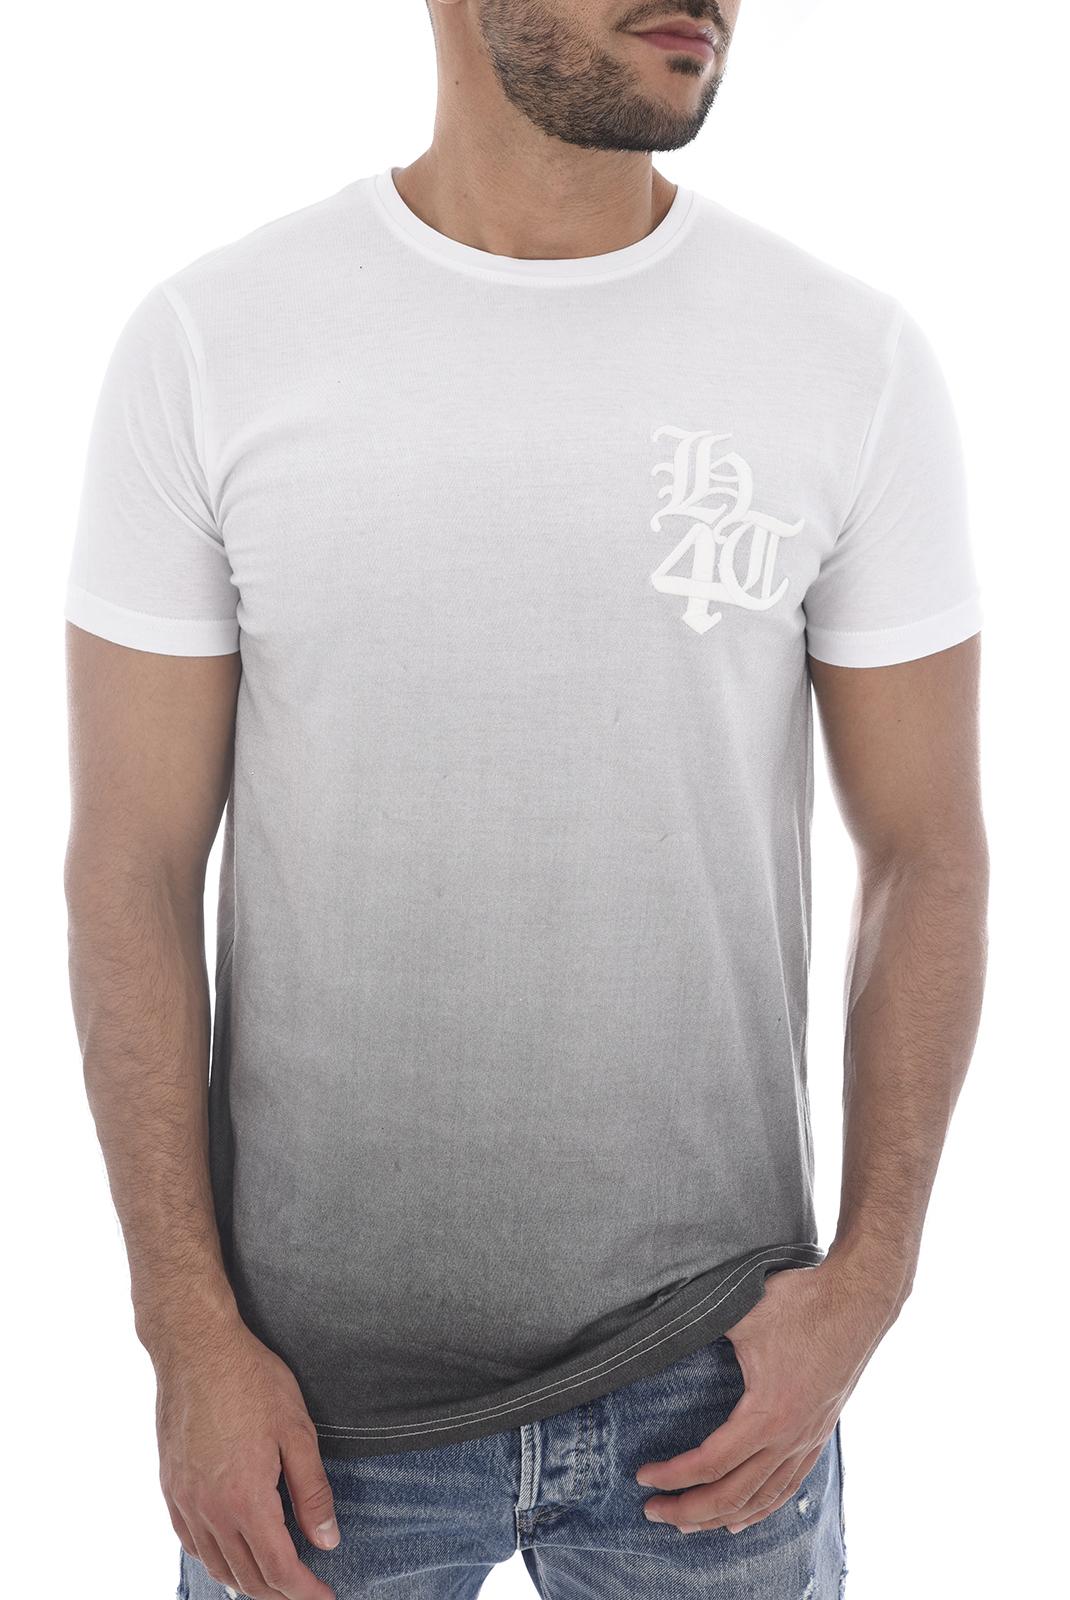 Tee-shirts  Hite couture MURER BLANC